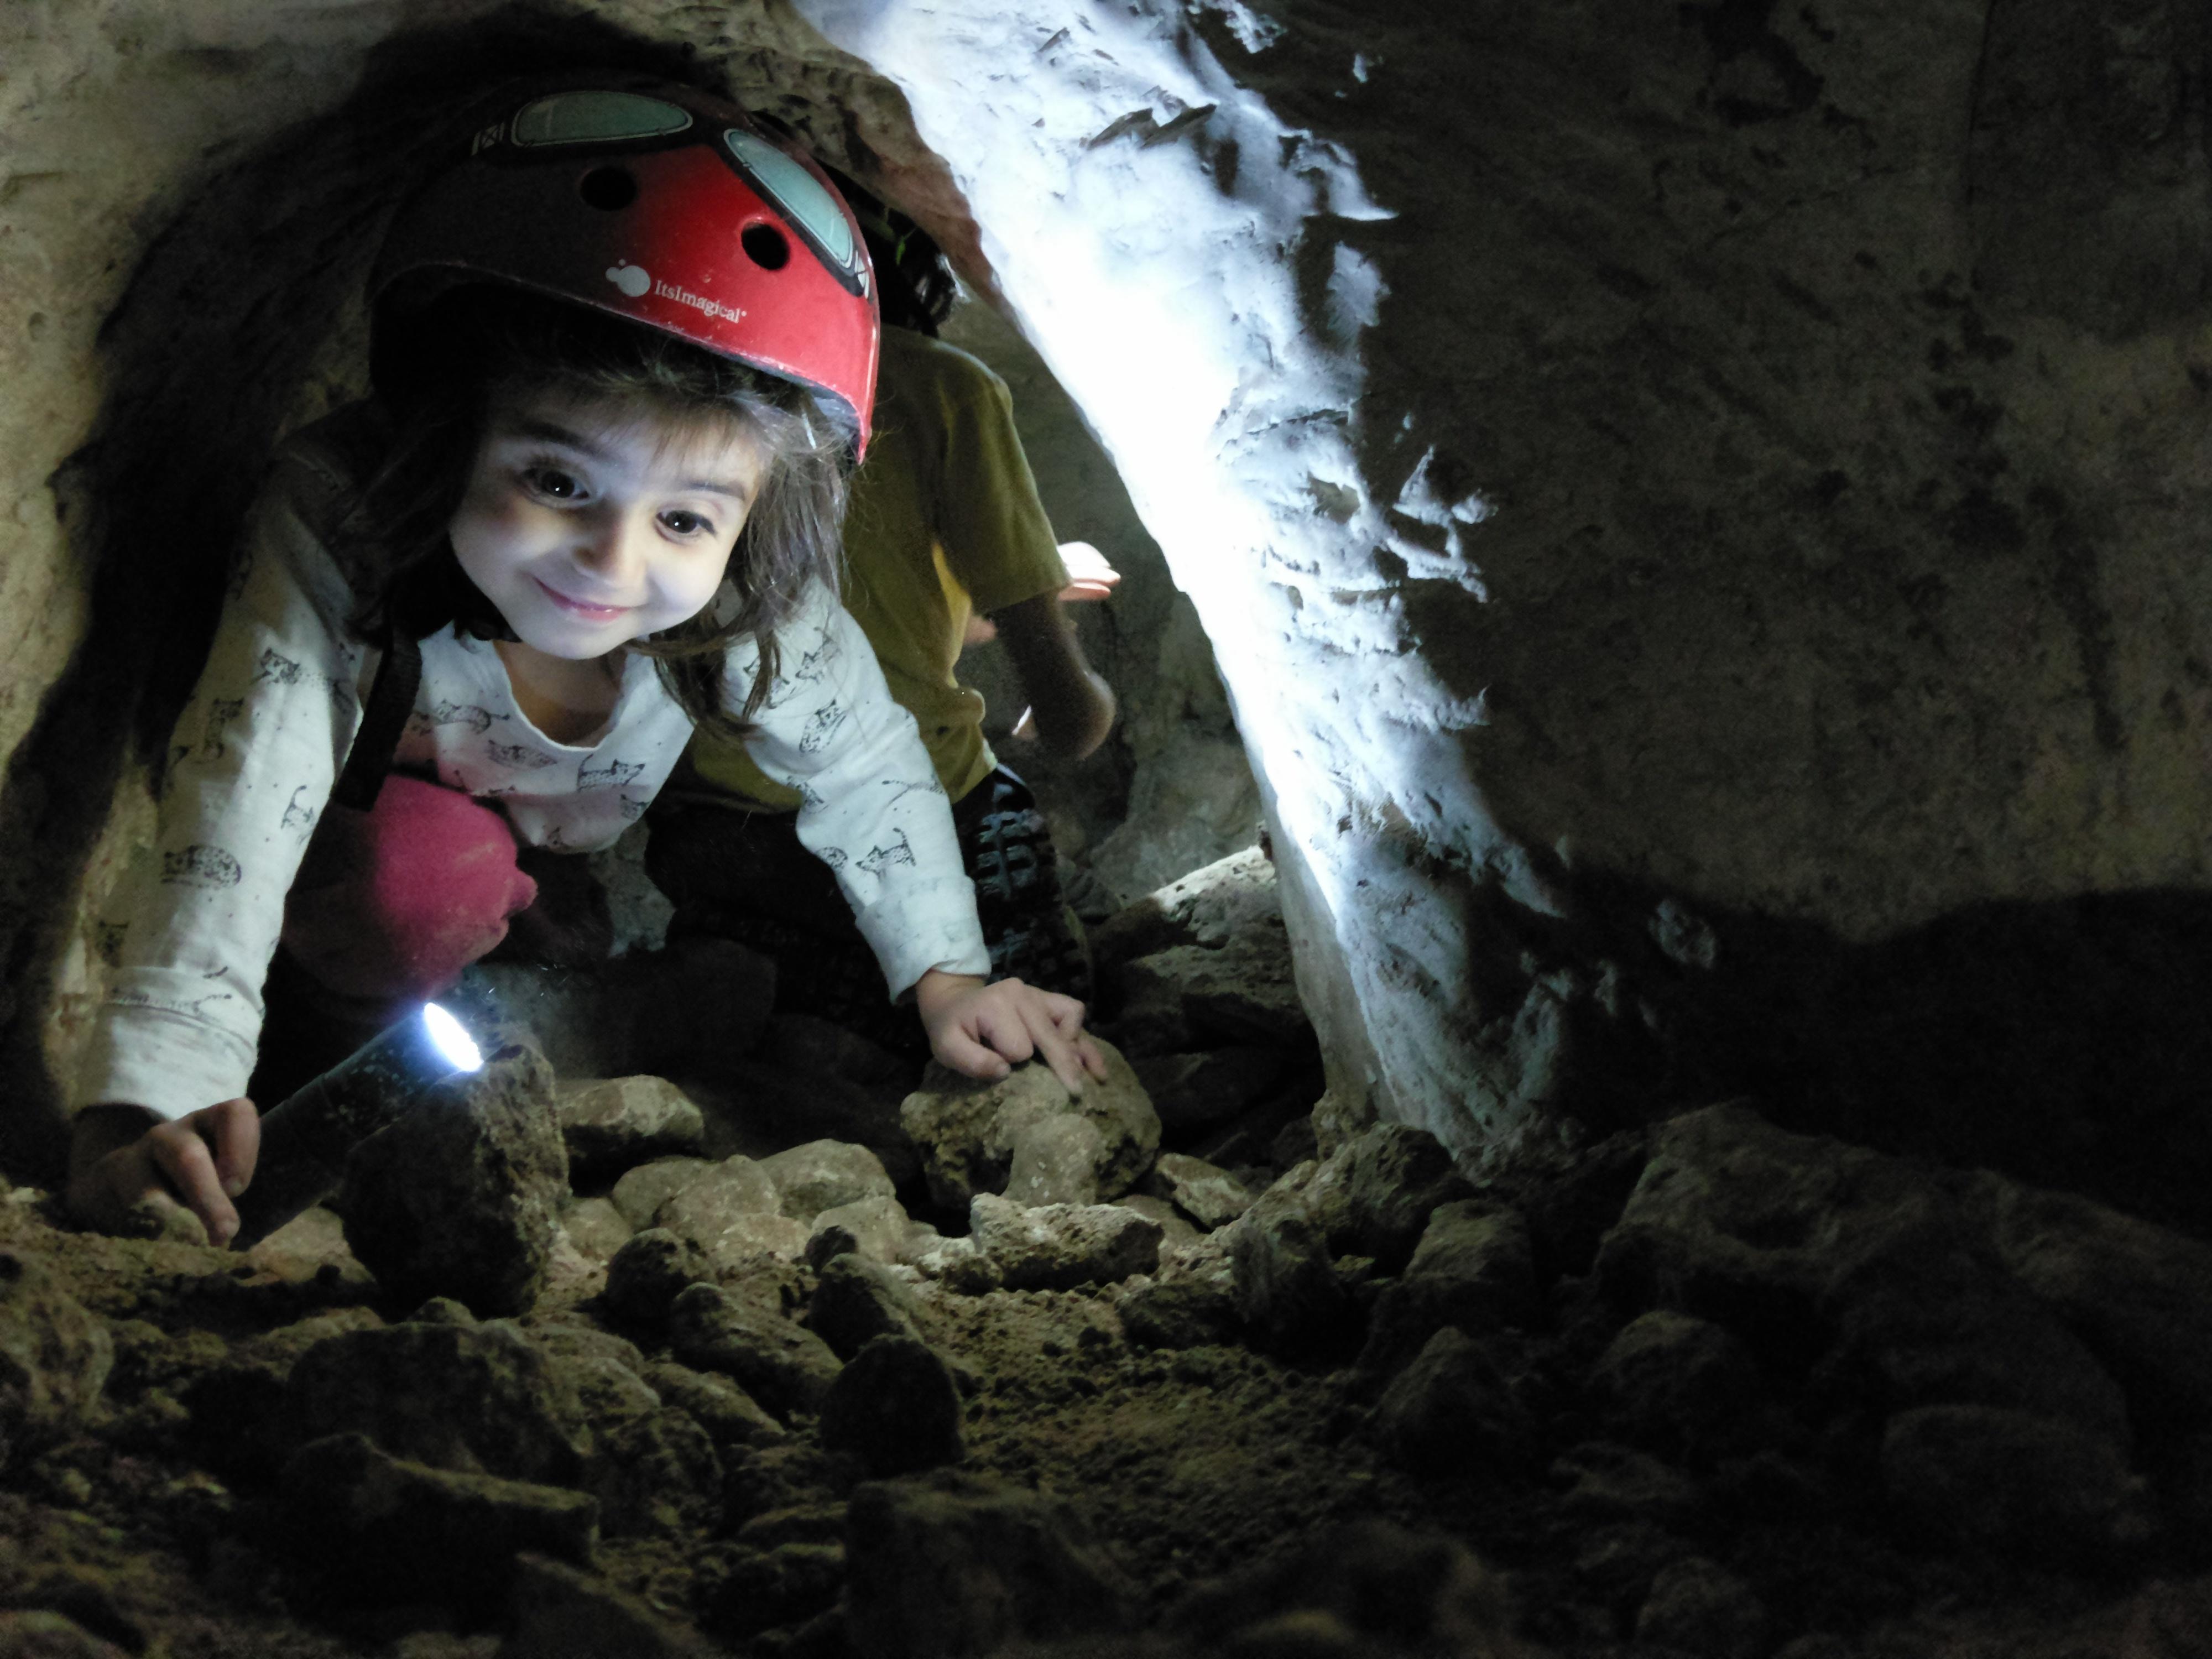 Cave photo contest 014